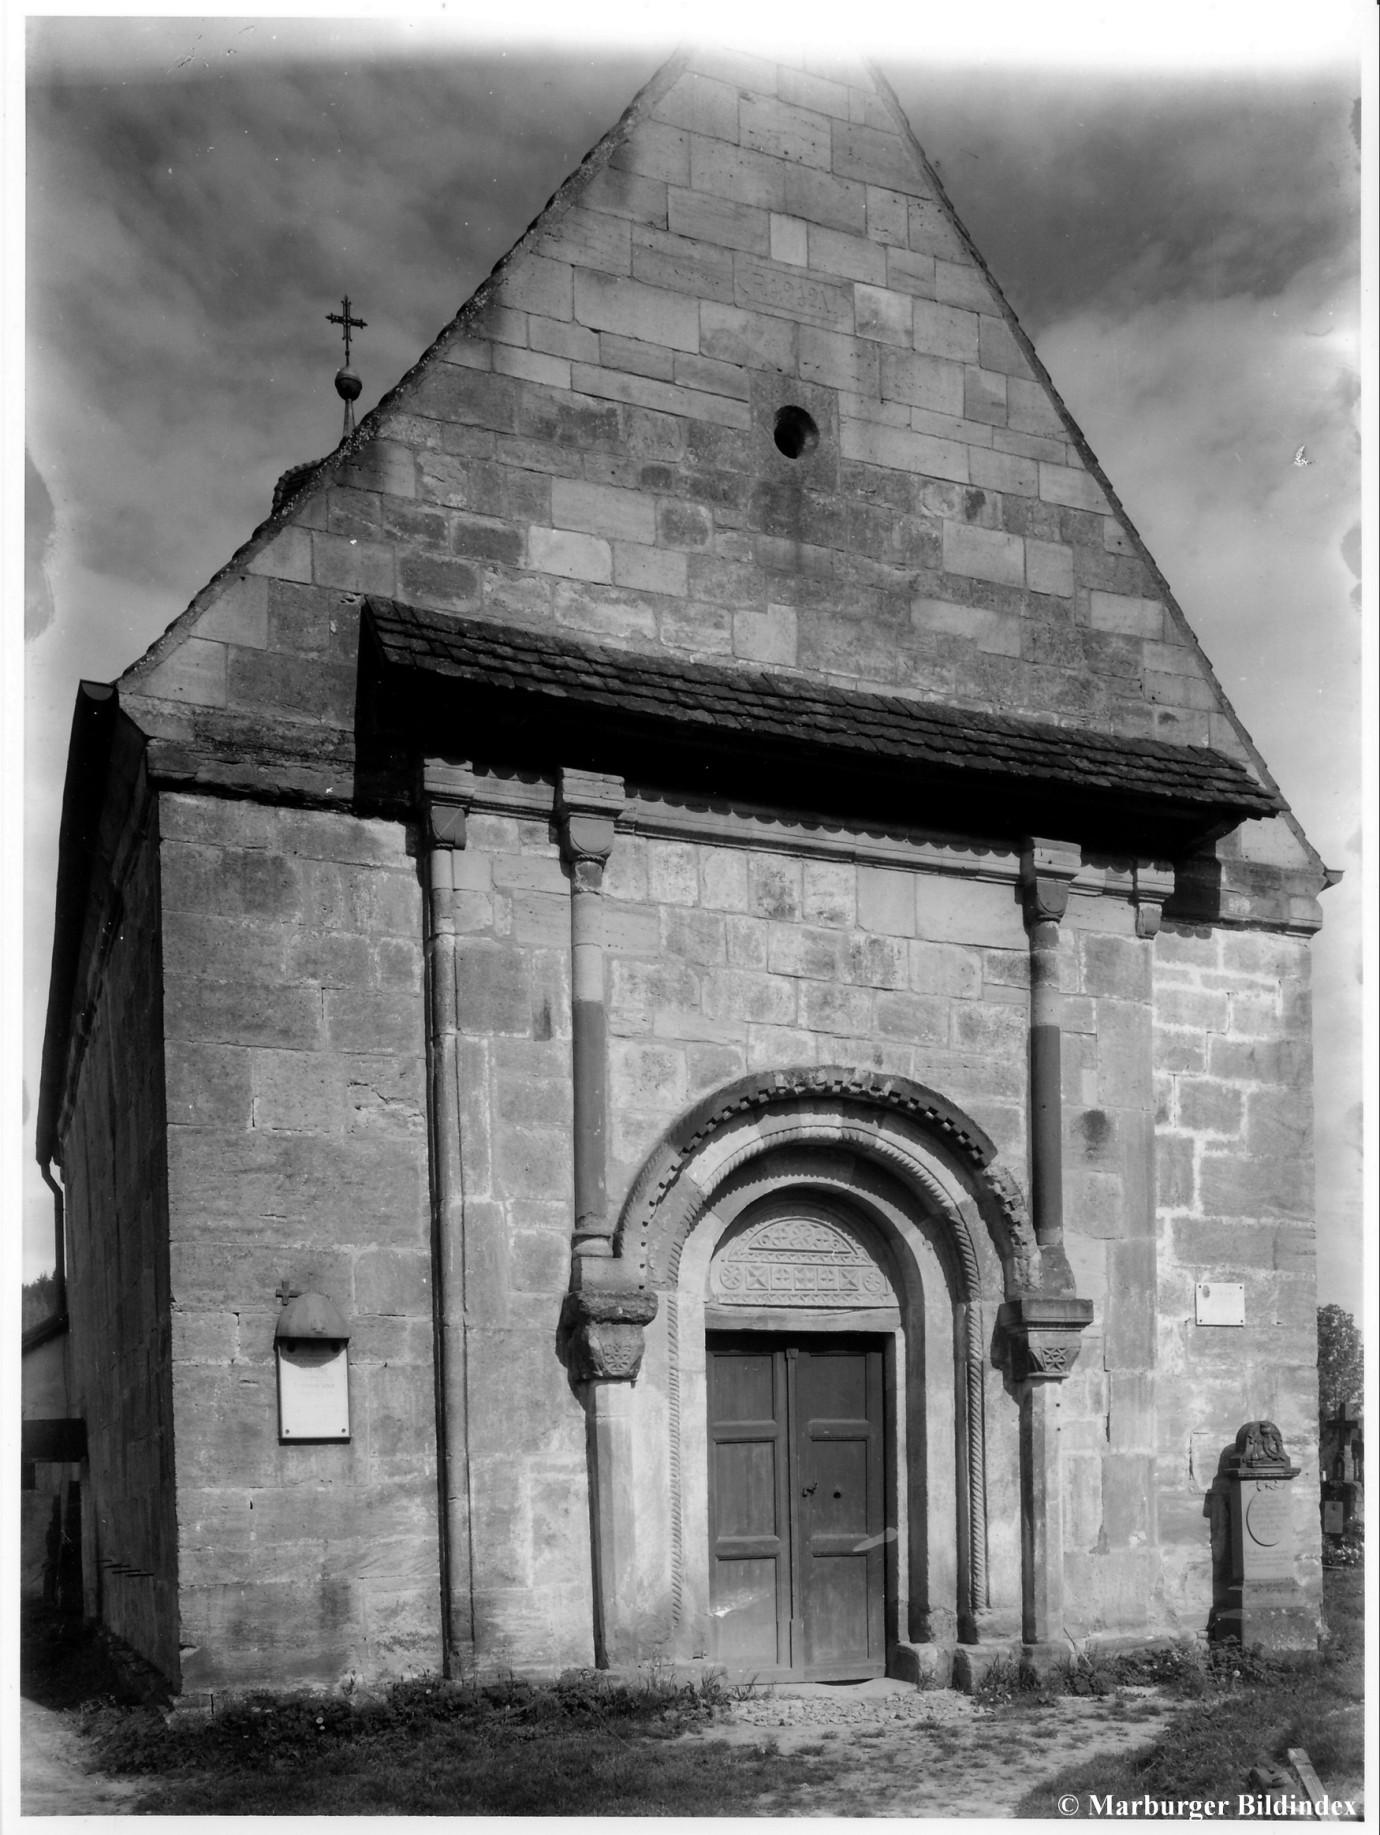 Dächle über dem Portal, angebracht 1710